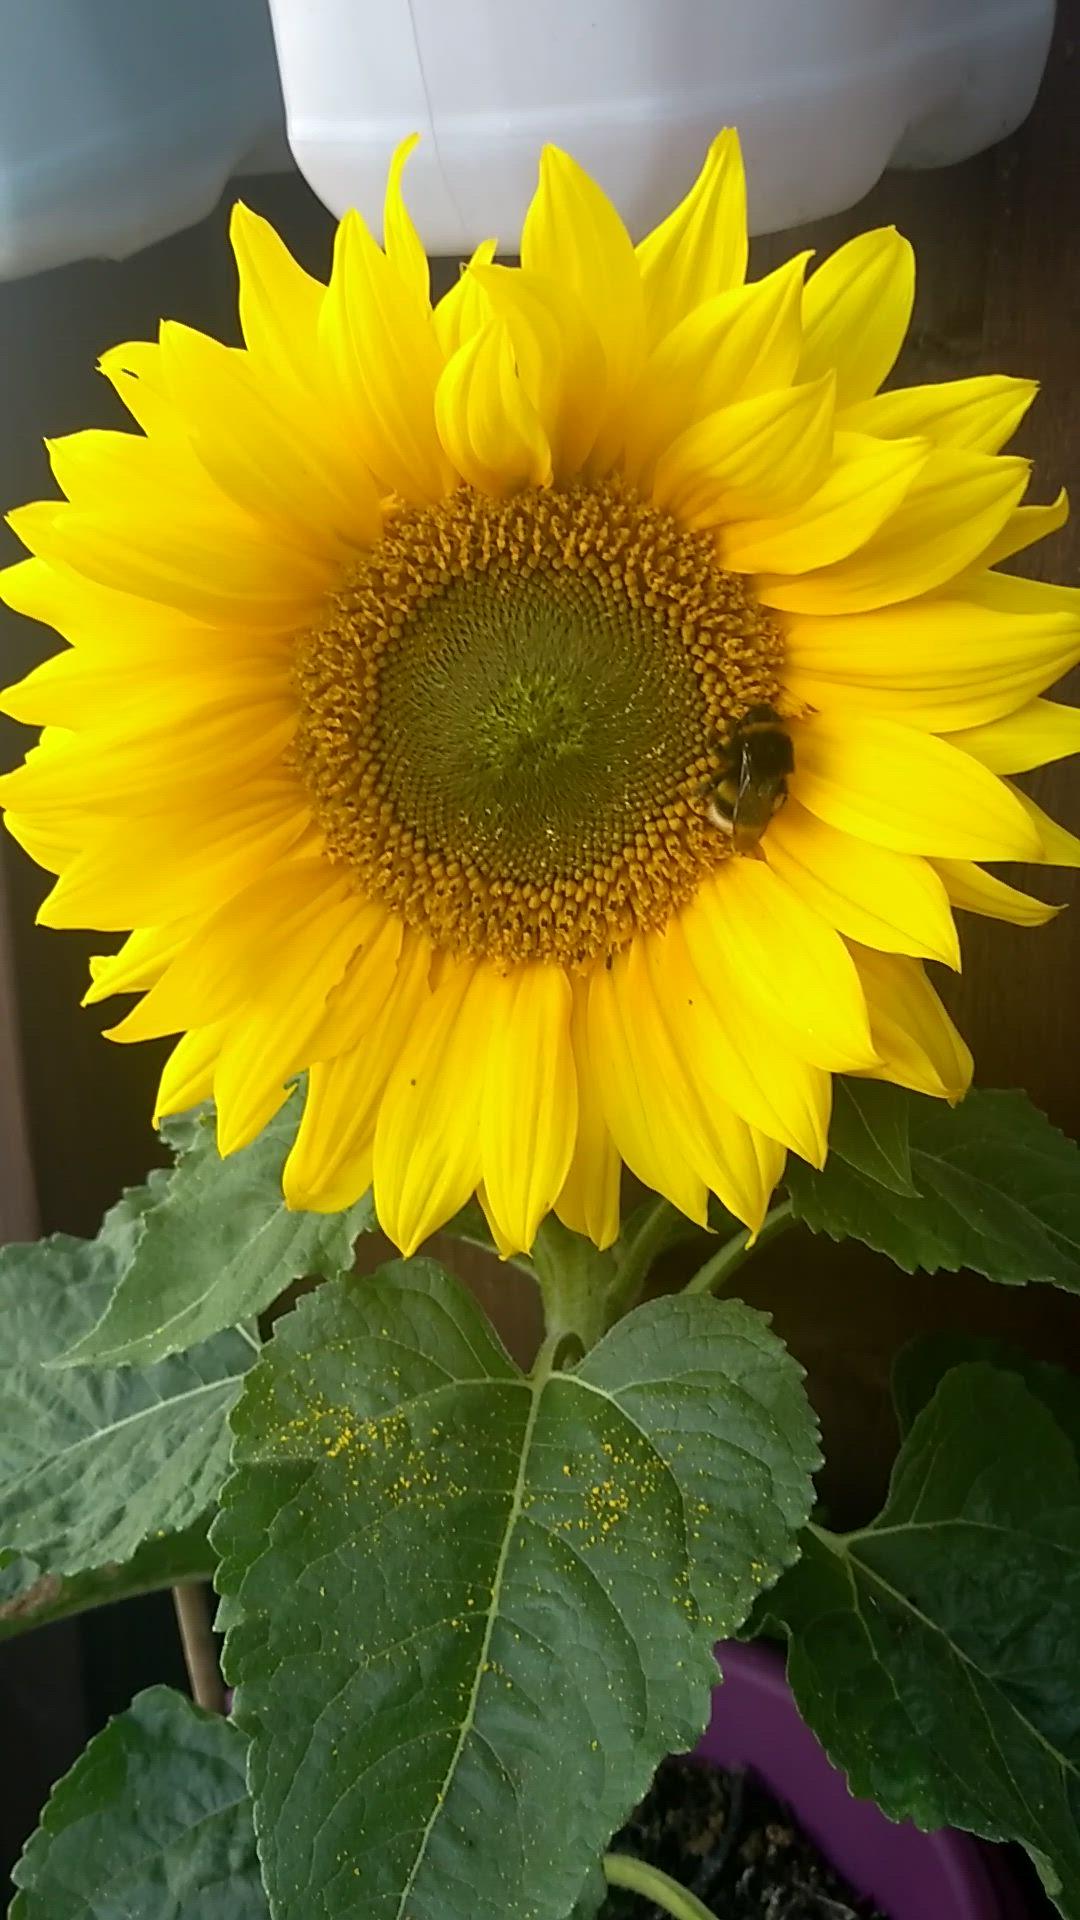 How To Grow Sunflowers On My Balcony